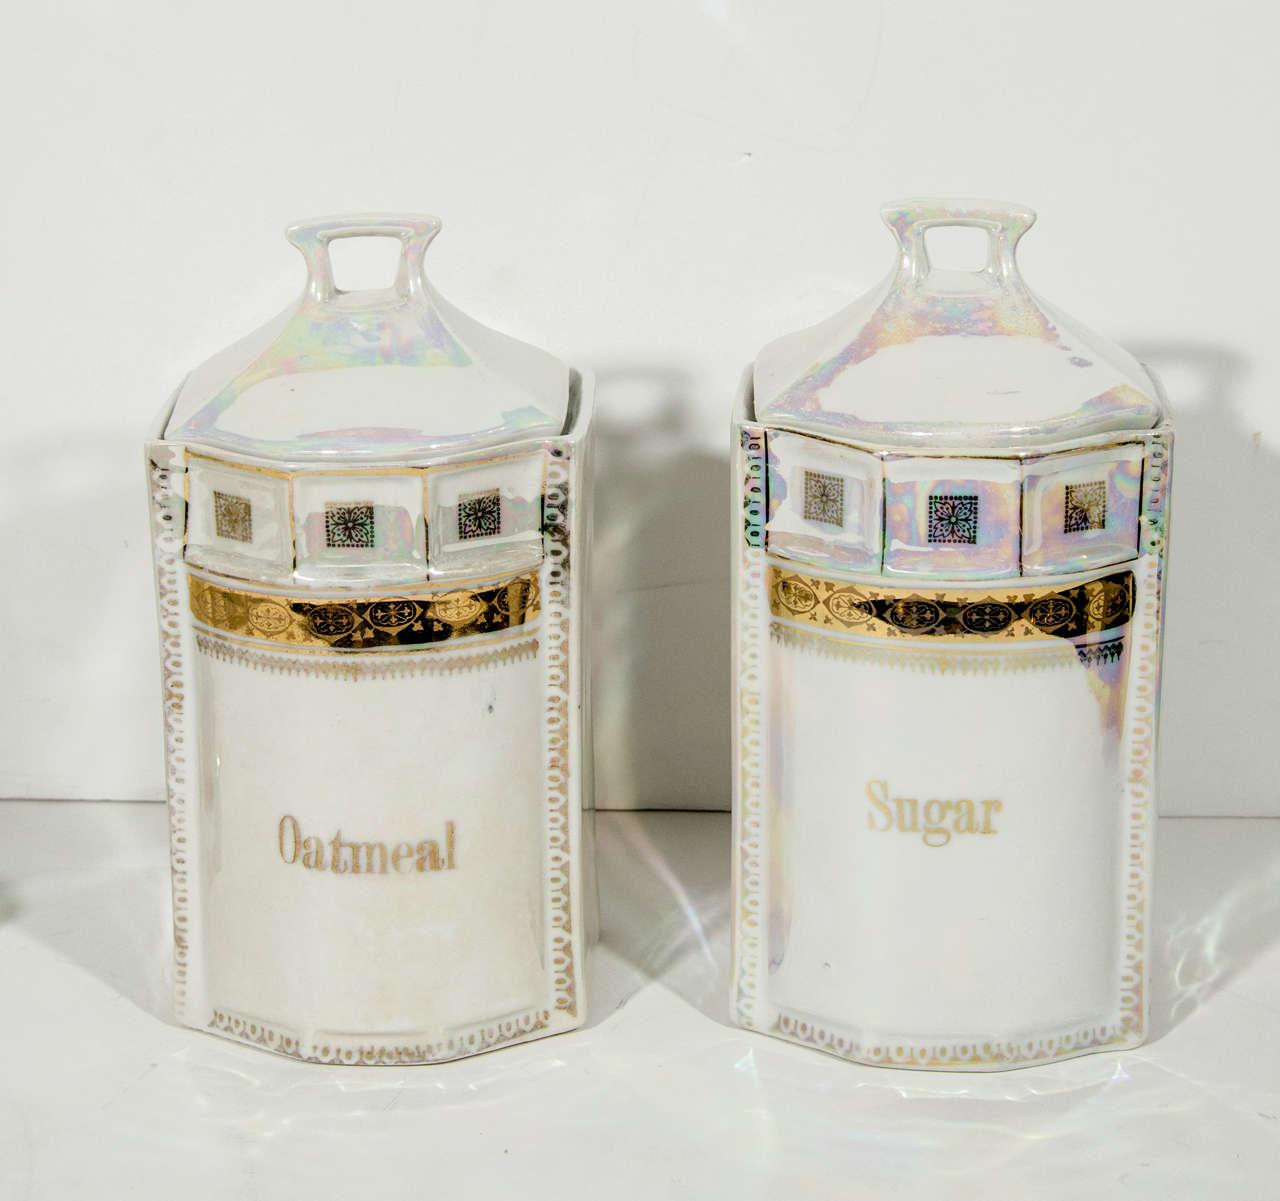 Antique German Porcelain Apothecary Jars and Spice Set, 12 Piece For Sale 4